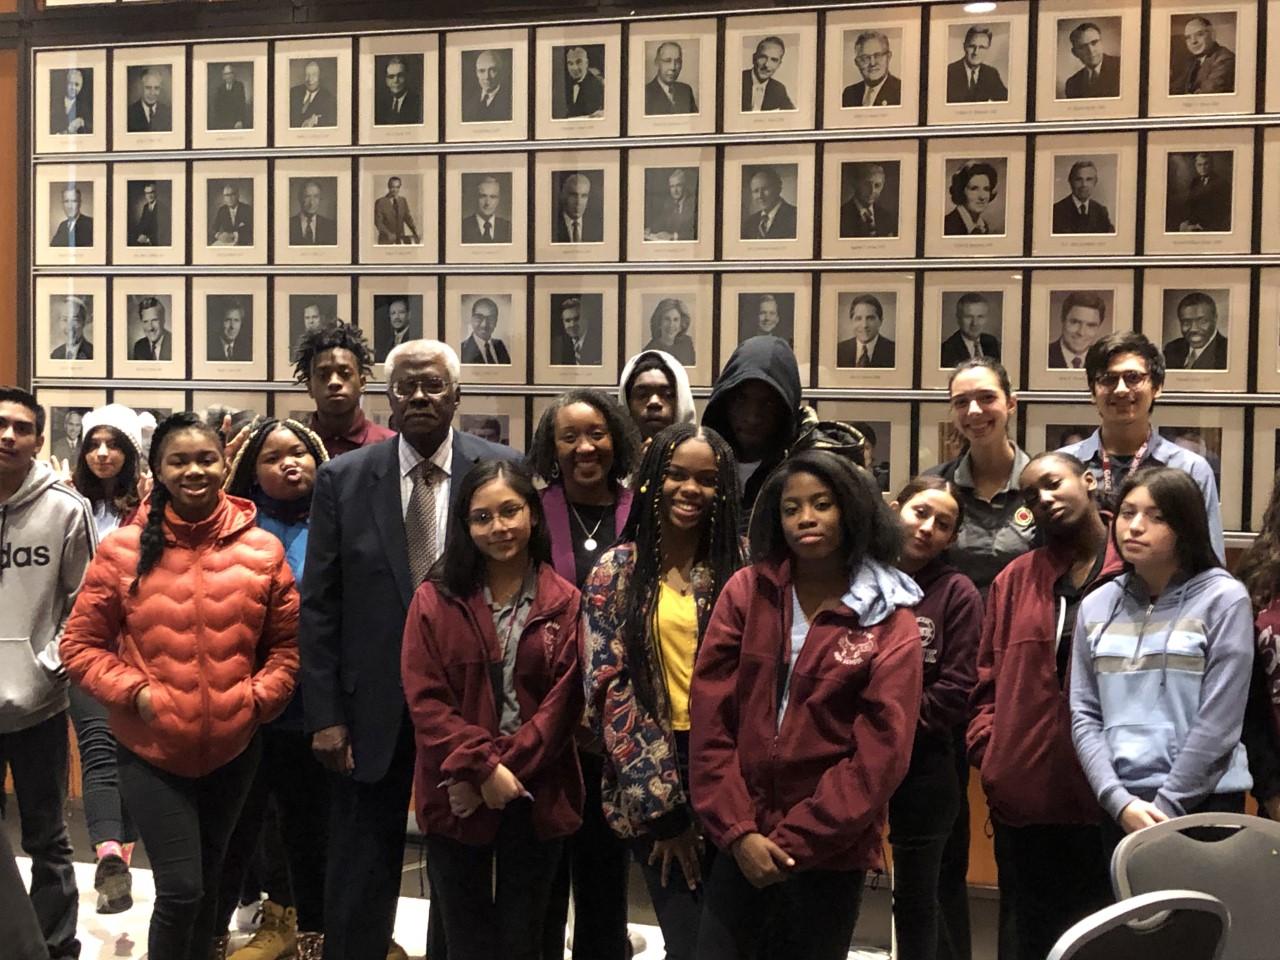 William J. Hibbler Schoolhouse To Courthouse Program